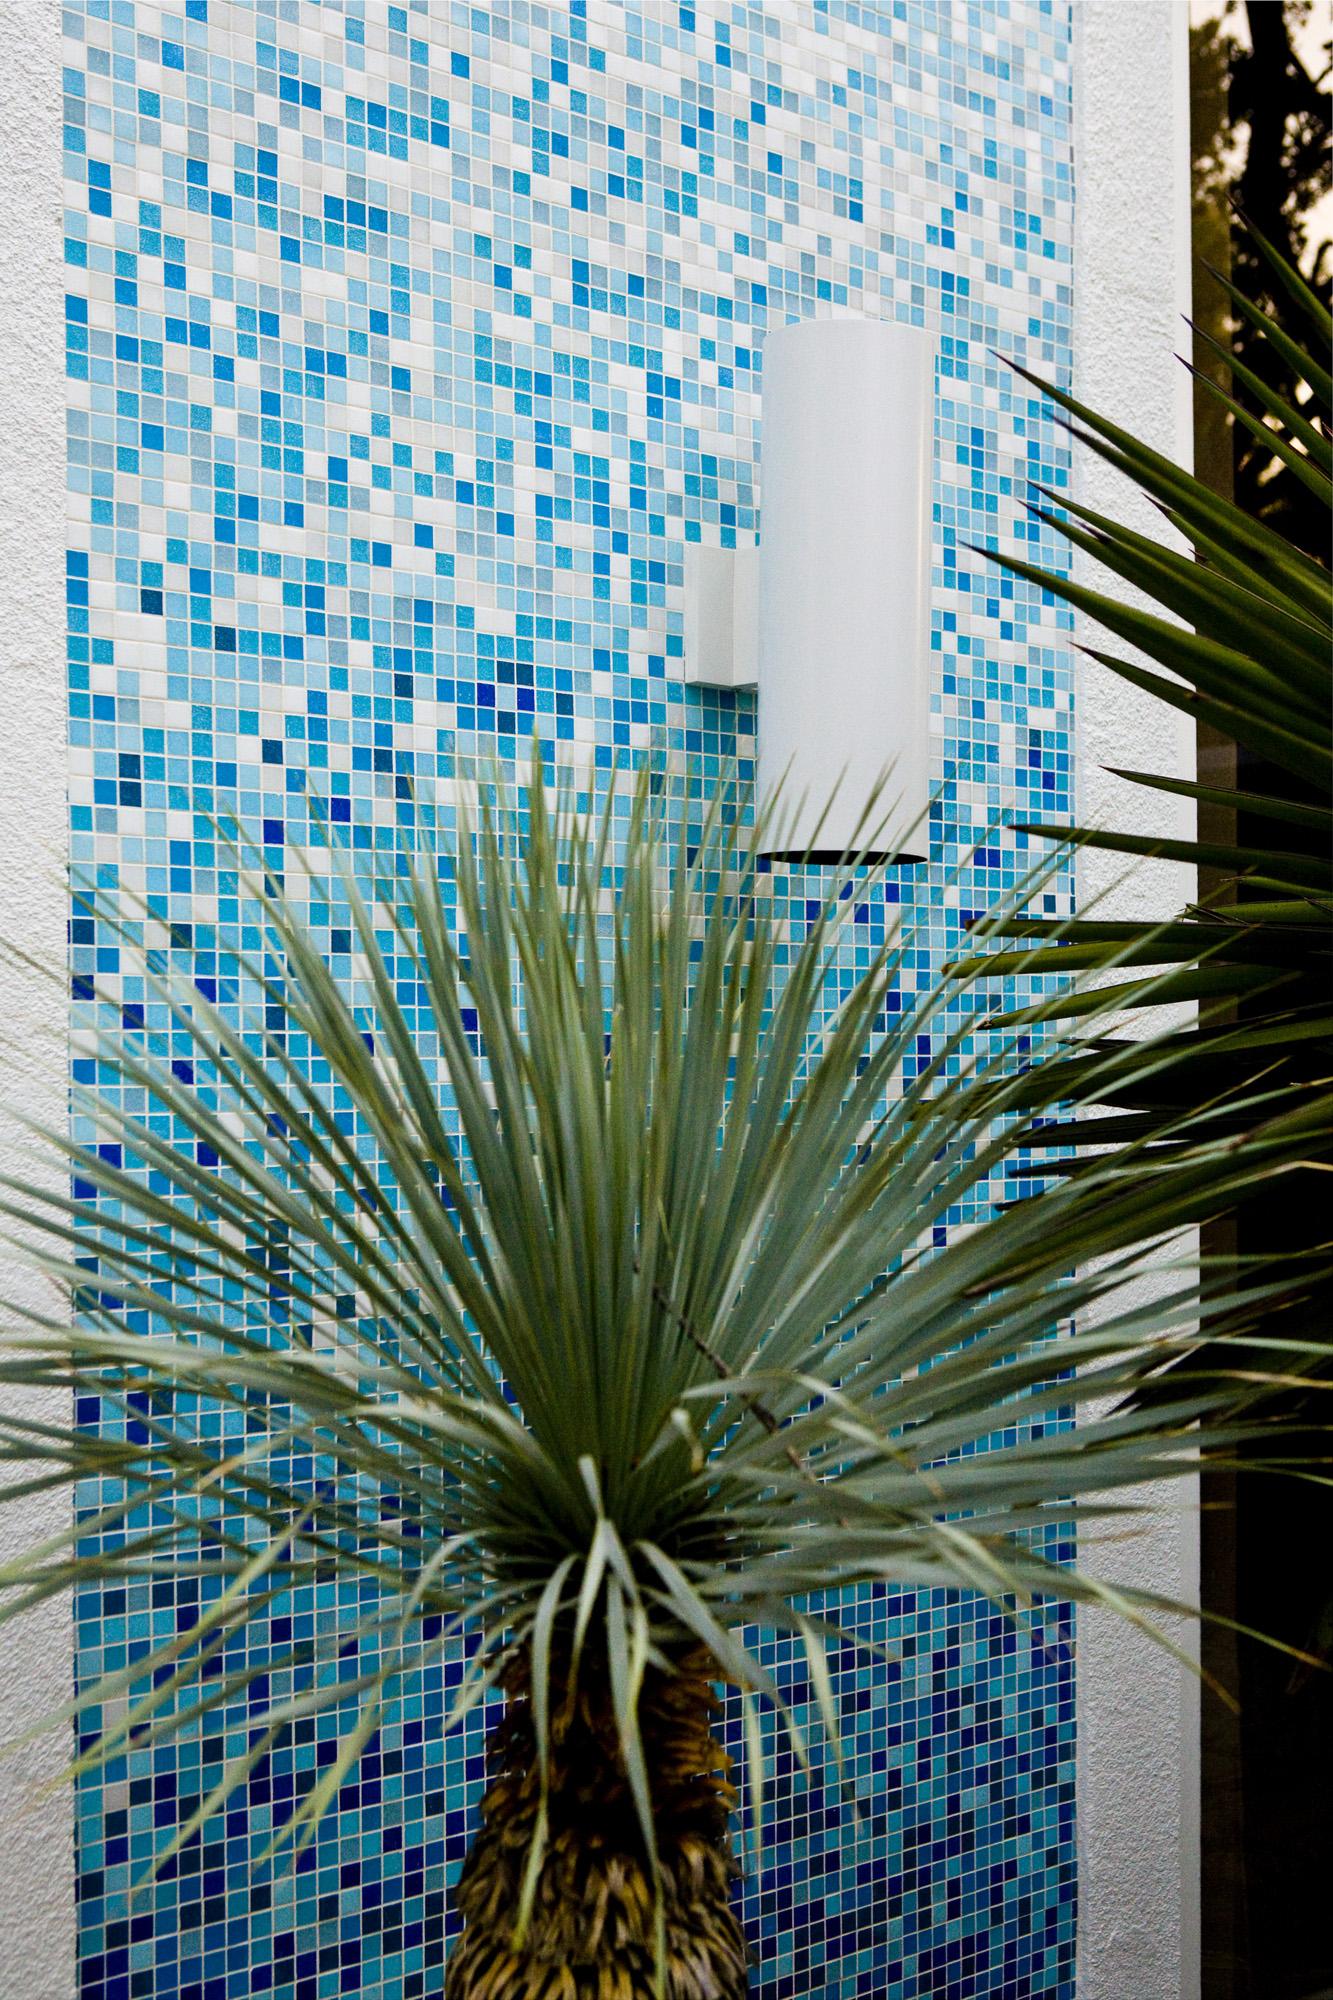 Modern Mosaic Wall _MG_3492.jpg